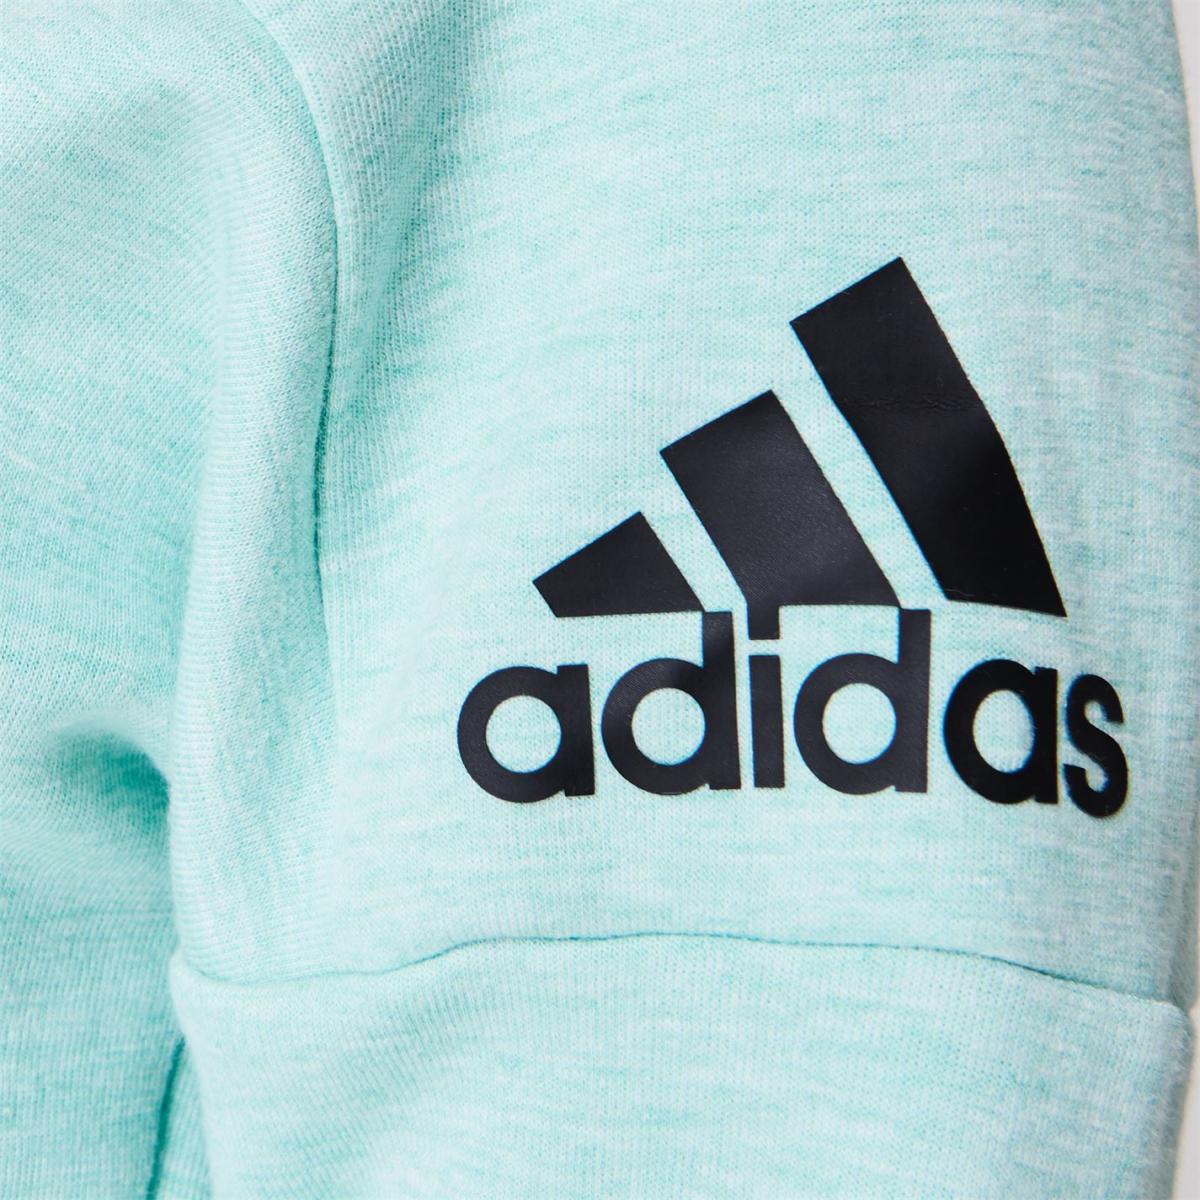 adidas Id Stadium Kapuzenjacke Kapuzenpullover Damen Sweatshirt Pullover 9314